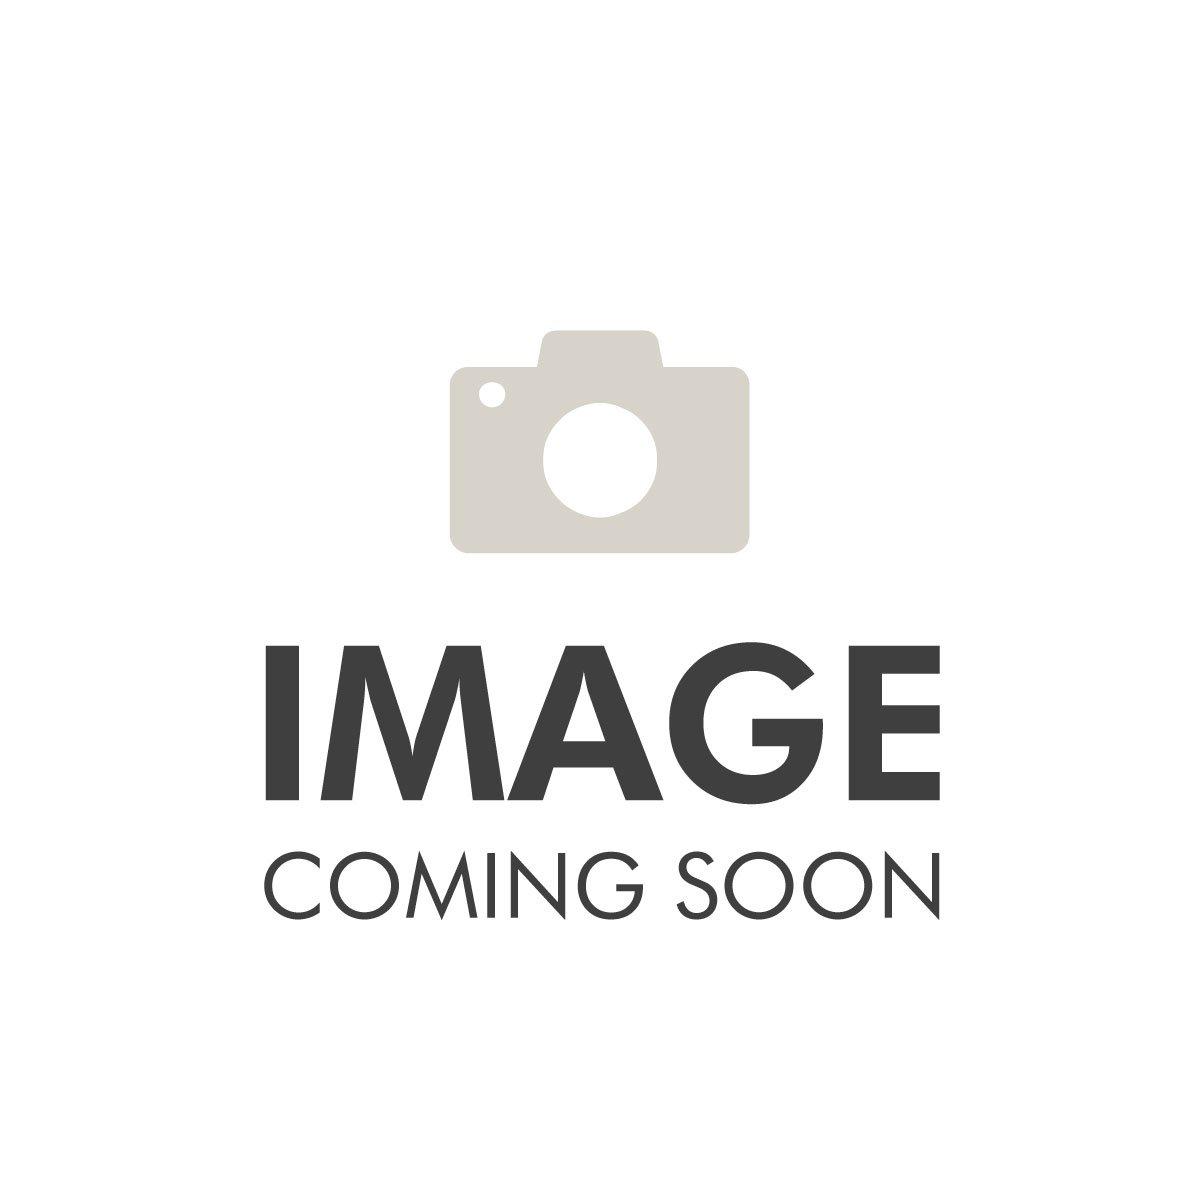 Allstar - Isolateur de coquille de sabre